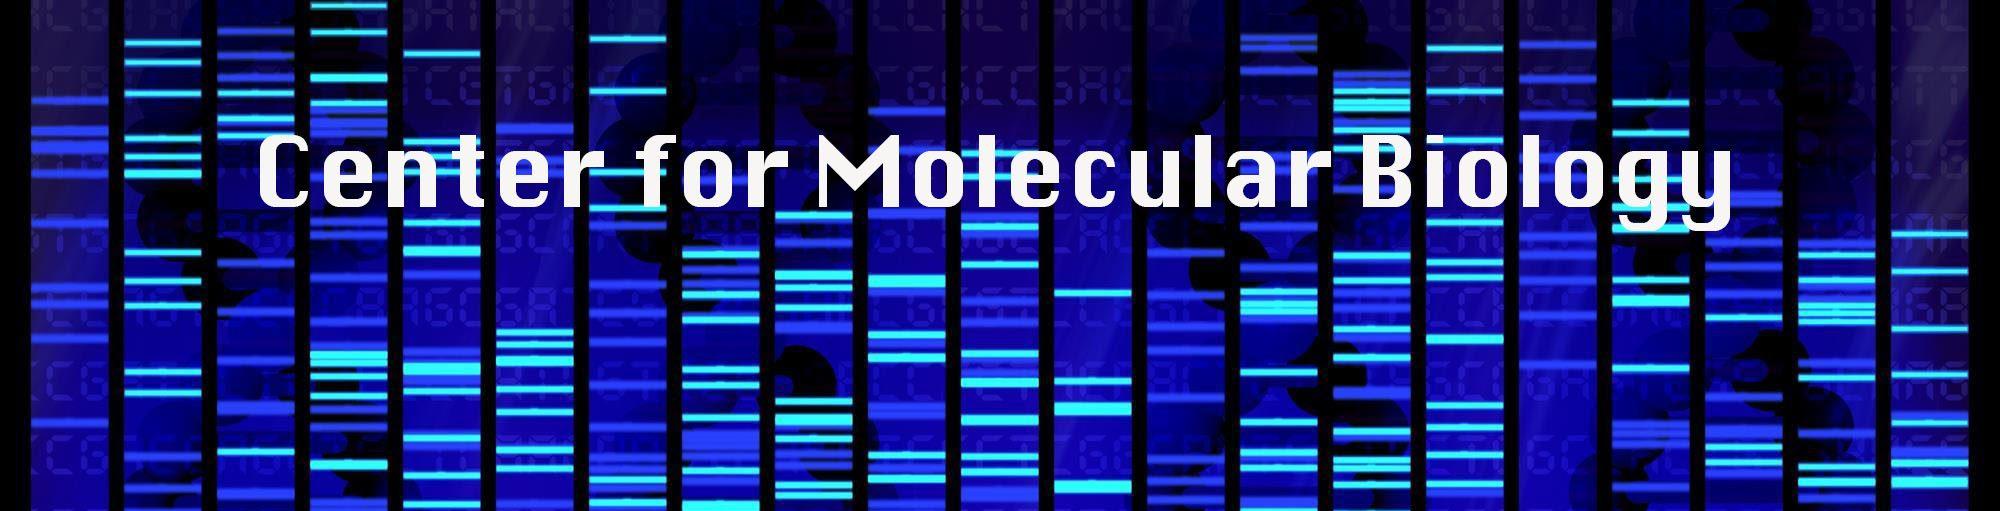 The Center for Molecular Biology